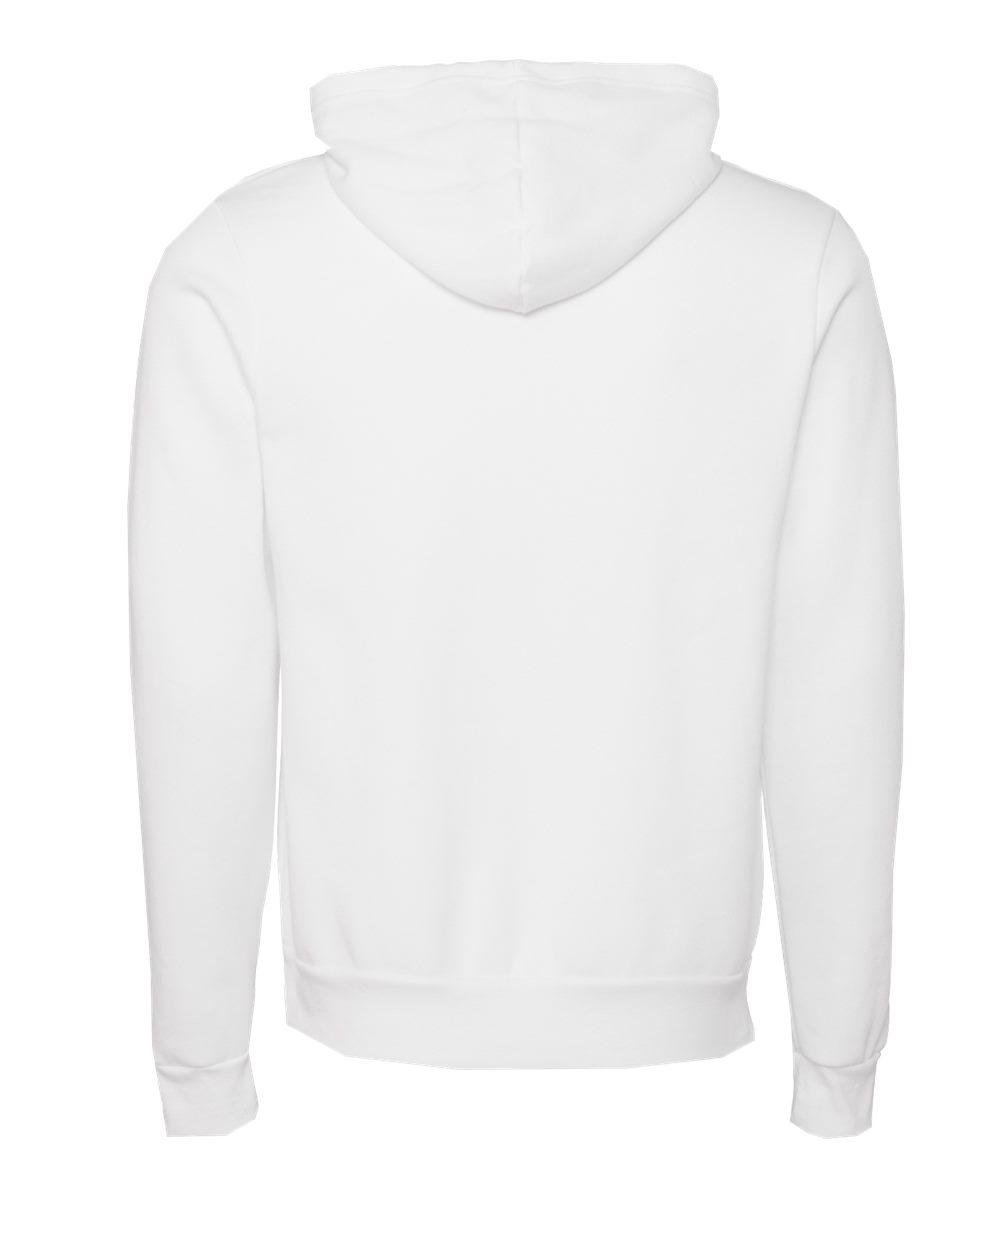 Bella-Canvas-Unisex-Sponge-Hooded-Pullover-Sweatshirt-Blank-3719-up-to-2XL thumbnail 35